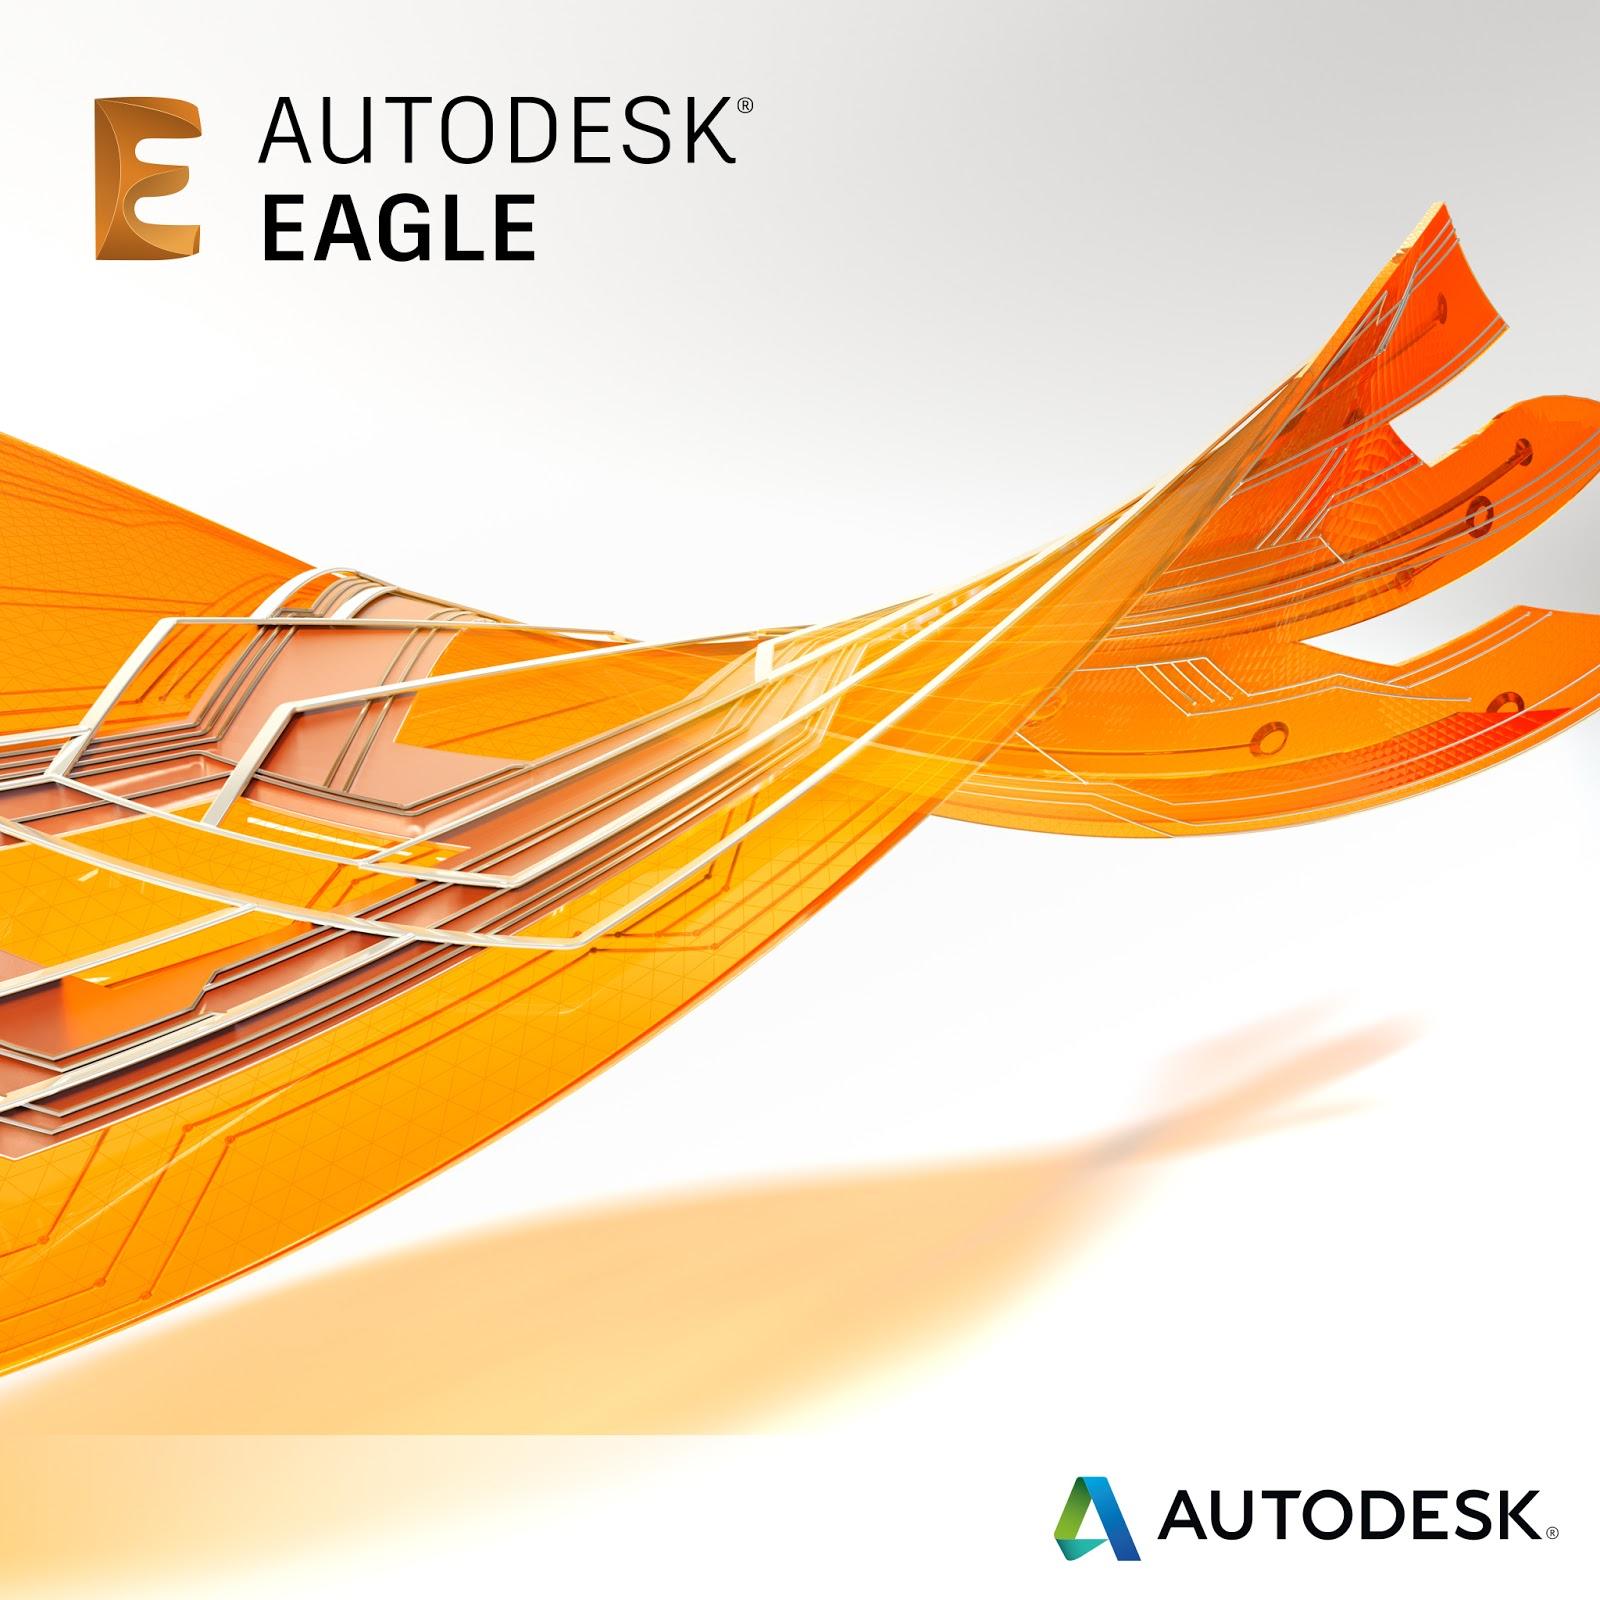 PC MAC SOFTWARE AND GAMES: Autodesk EAGLE Premium 8.0.1 + Crack